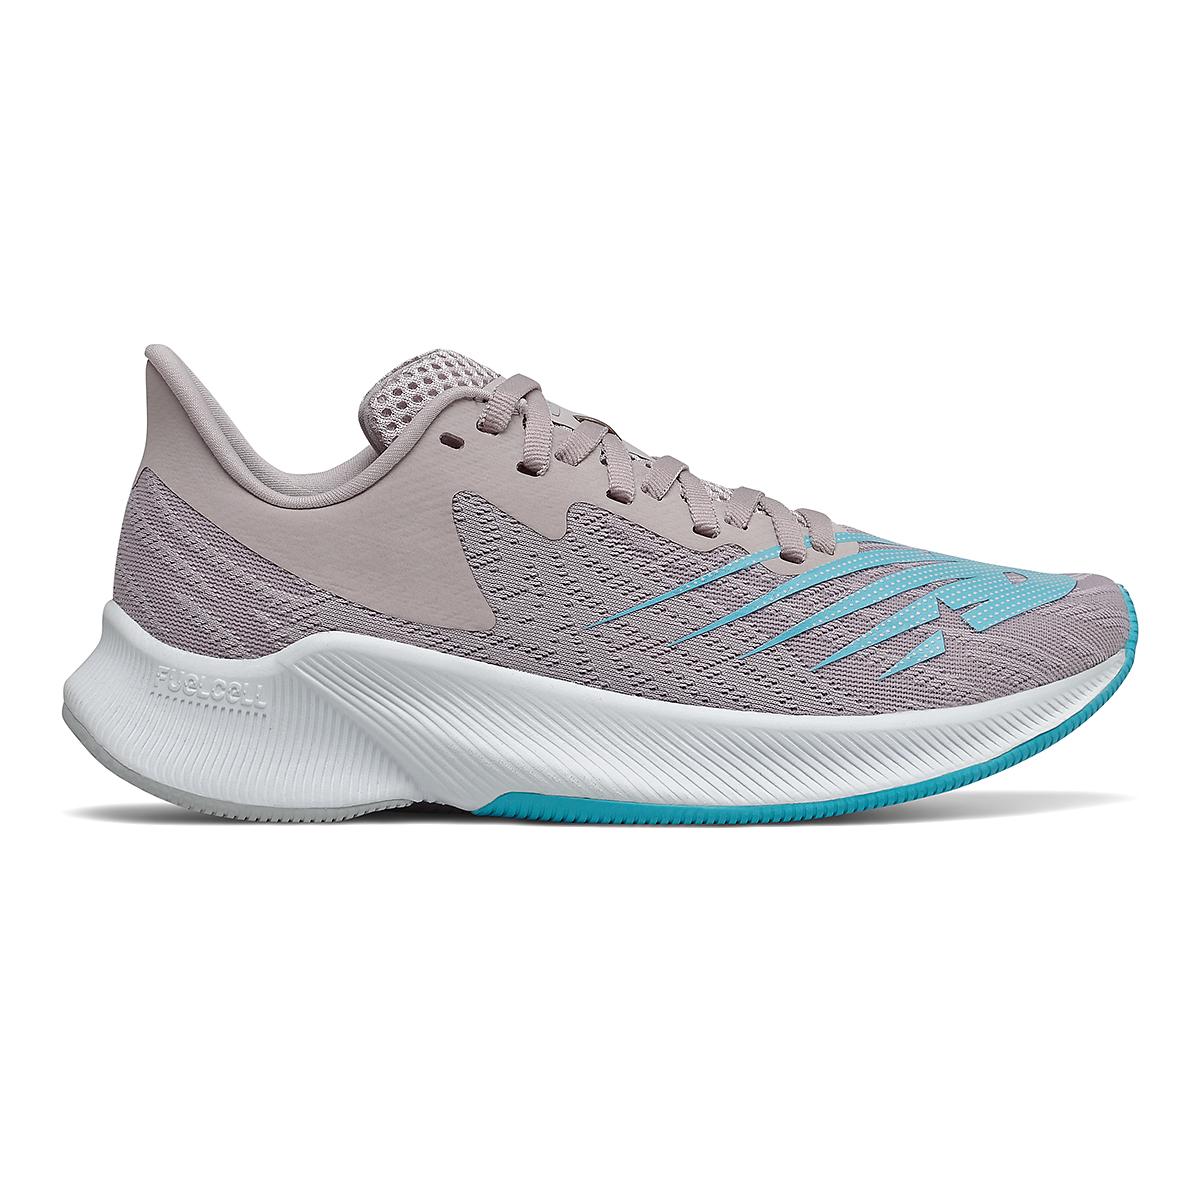 Women's New Balance Fuelcell Prism Running Shoe - Color: Logwood/Virtual Sky - Size: 5 - Width: Regular, Logwood/Virtual Sky, large, image 1